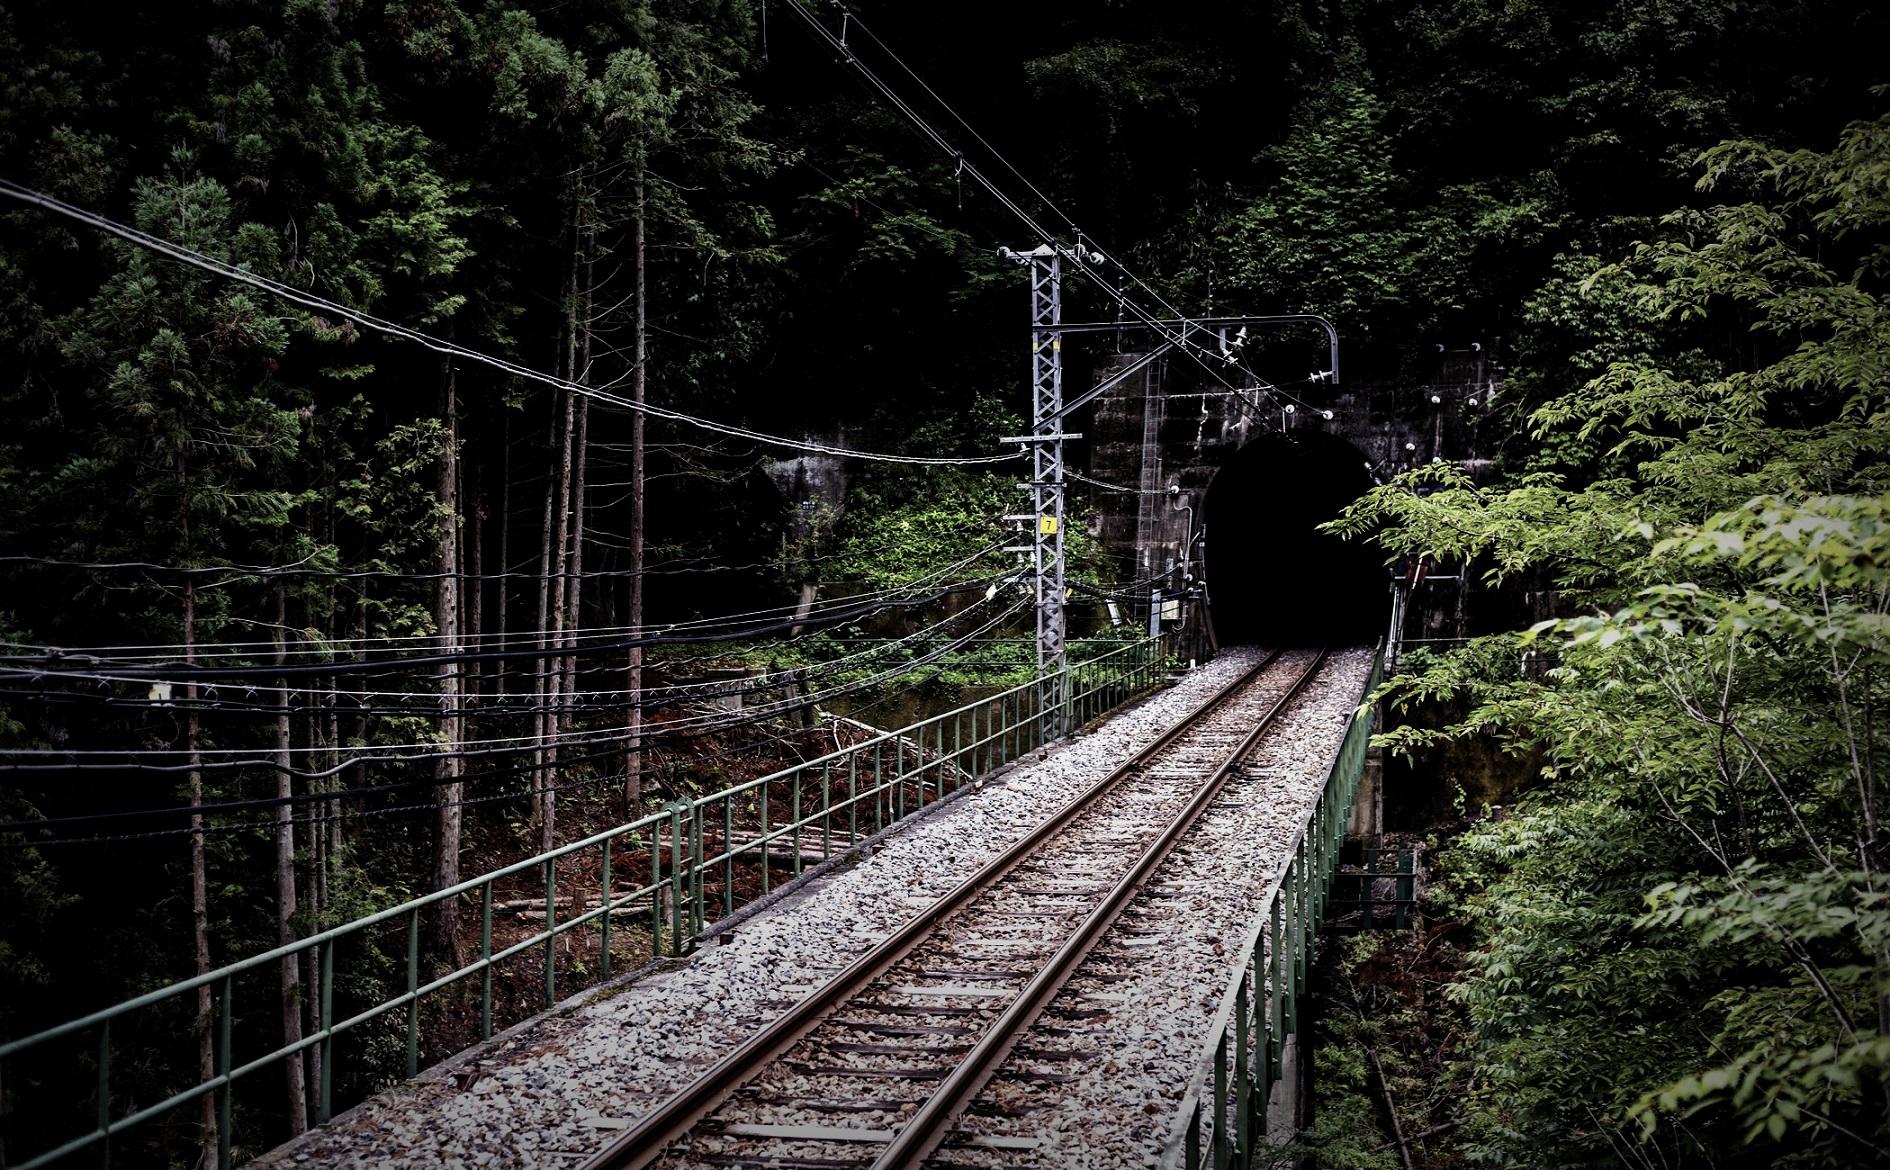 Mitos Kereta Misterius Dan Stasiun Iblis Kisaragi